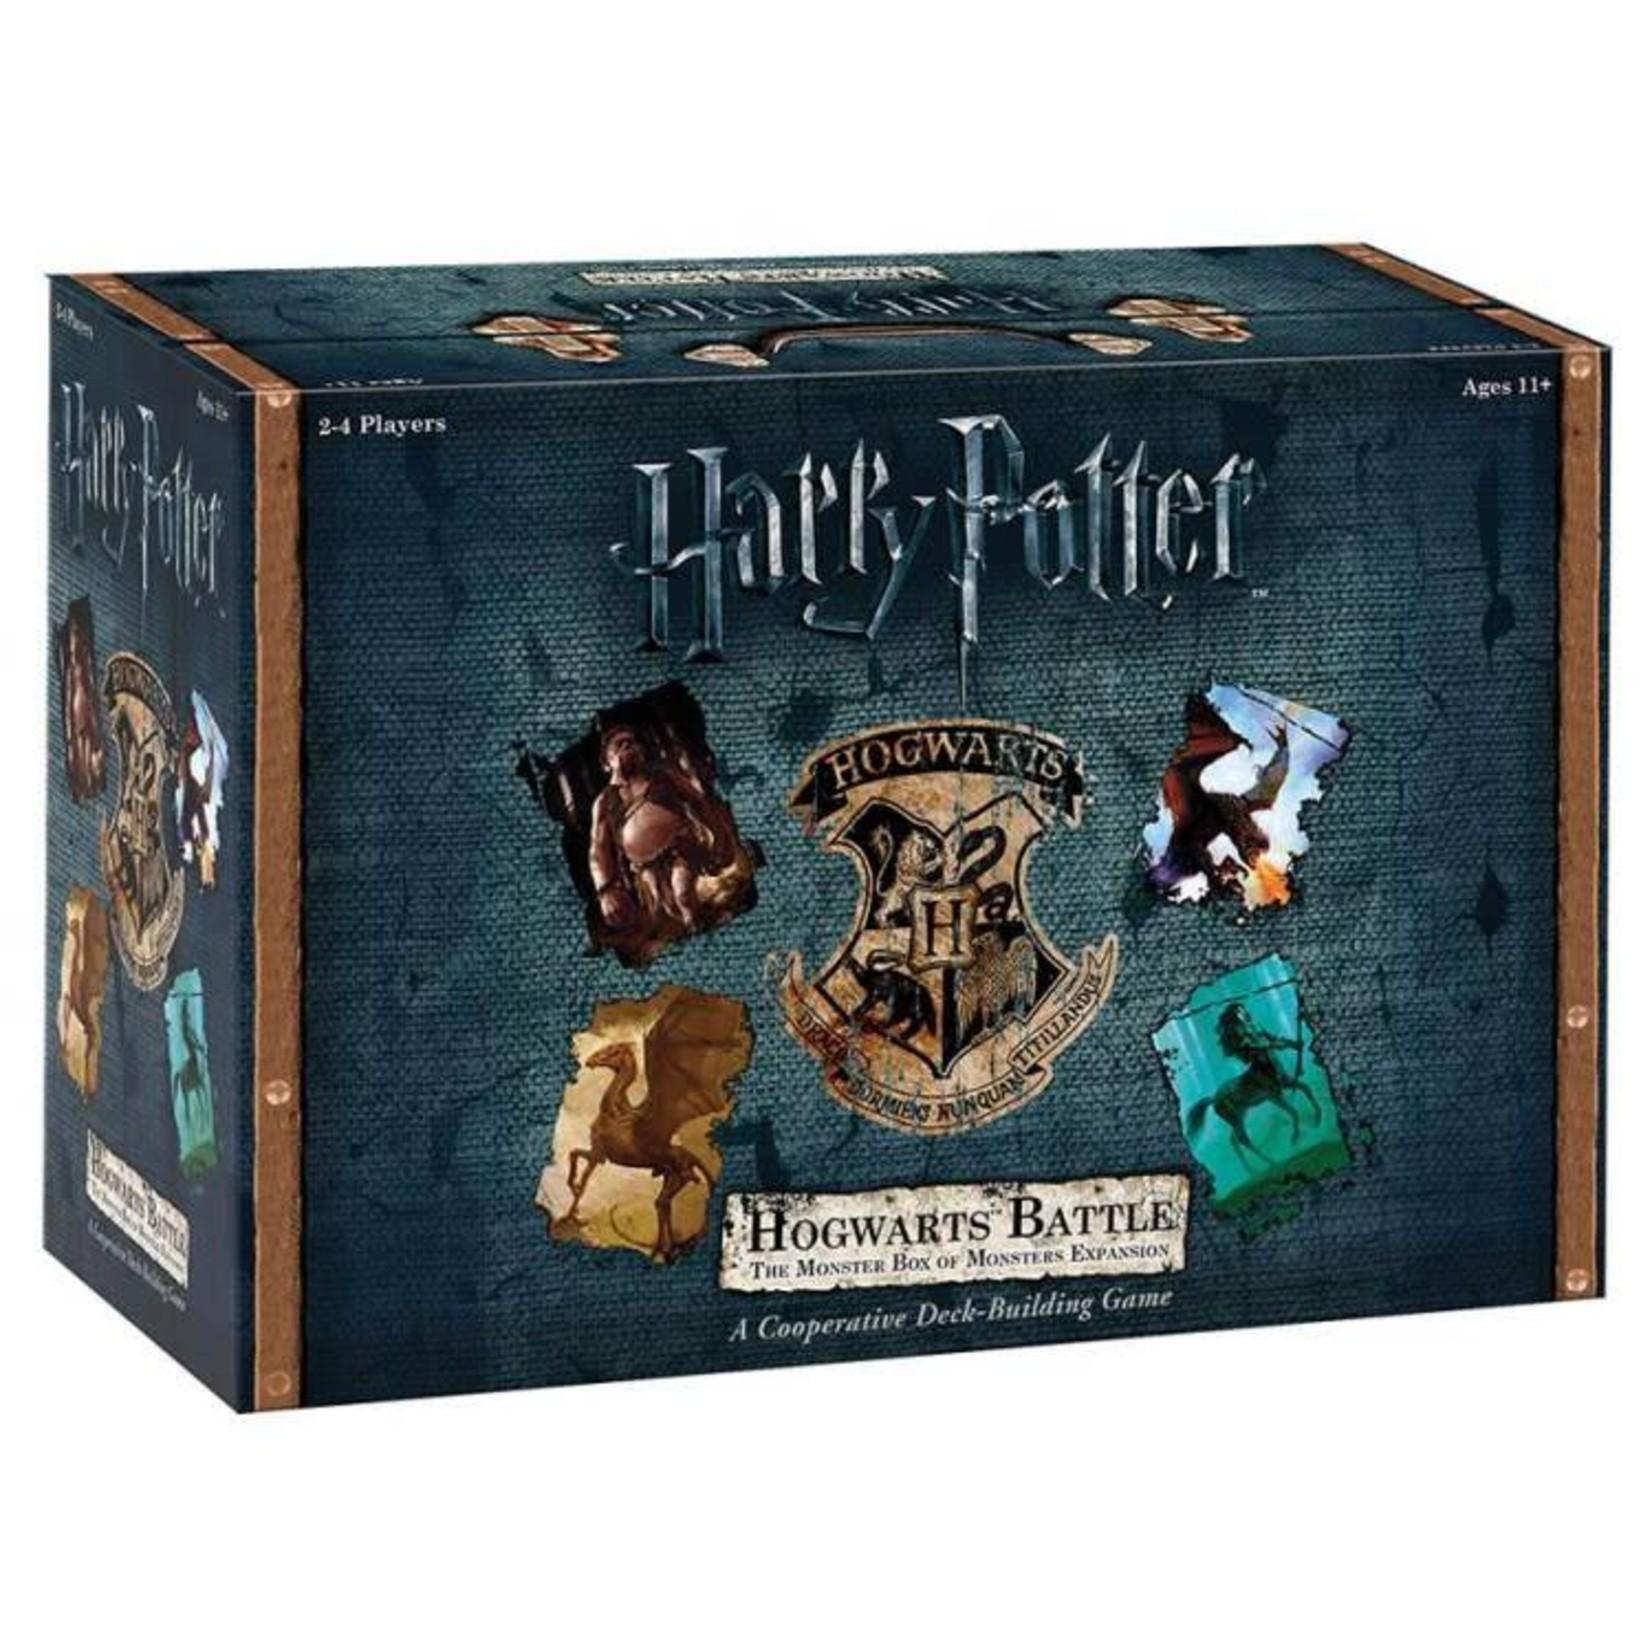 USAoploy Harry Potter Hogwarts Battle: Monster Box Monsters